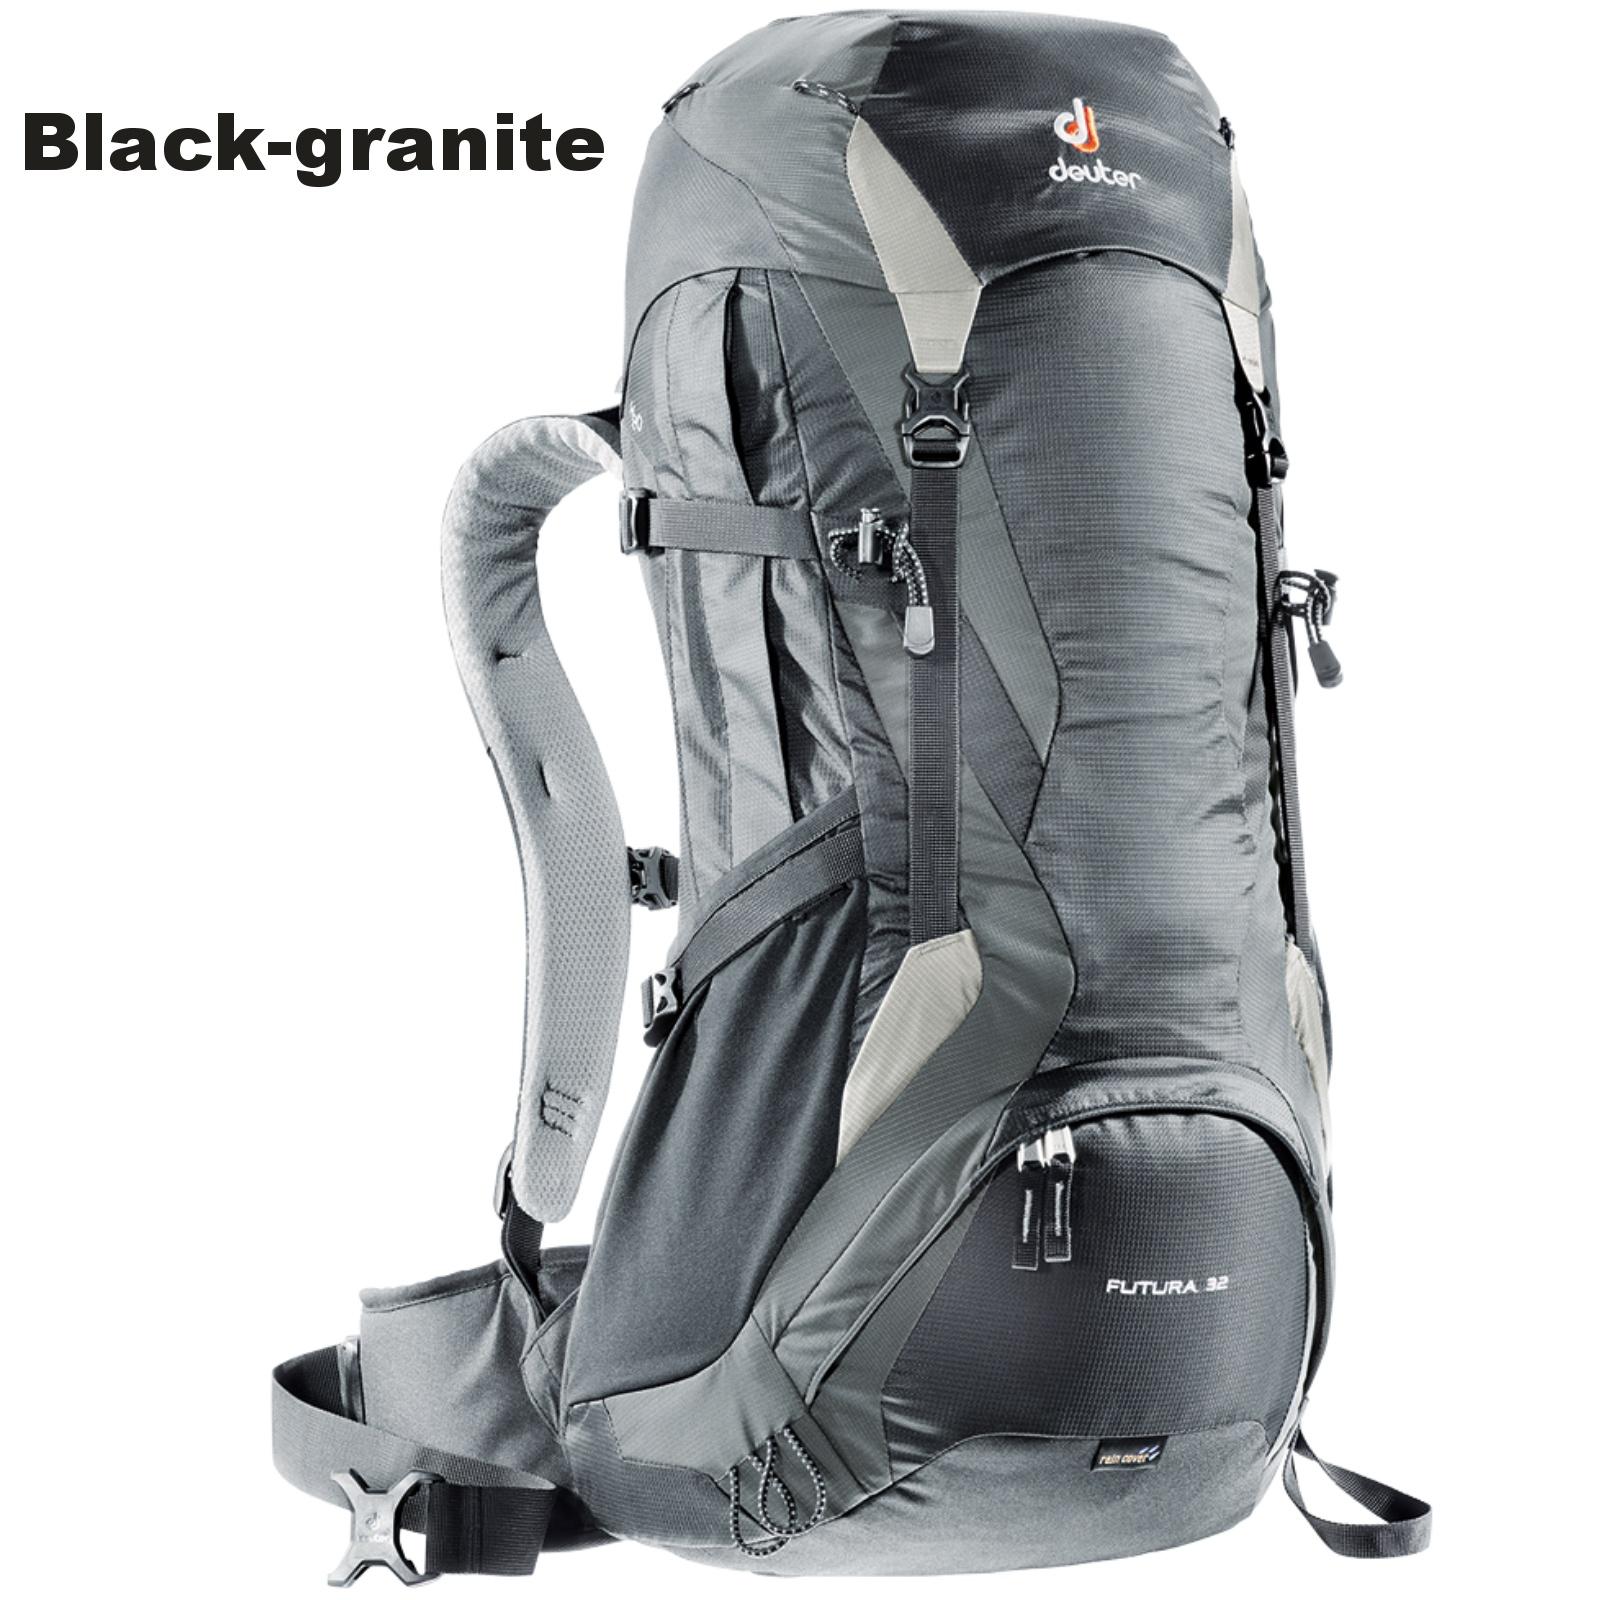 Batoh DEUTER Futura 32 l - black-granite